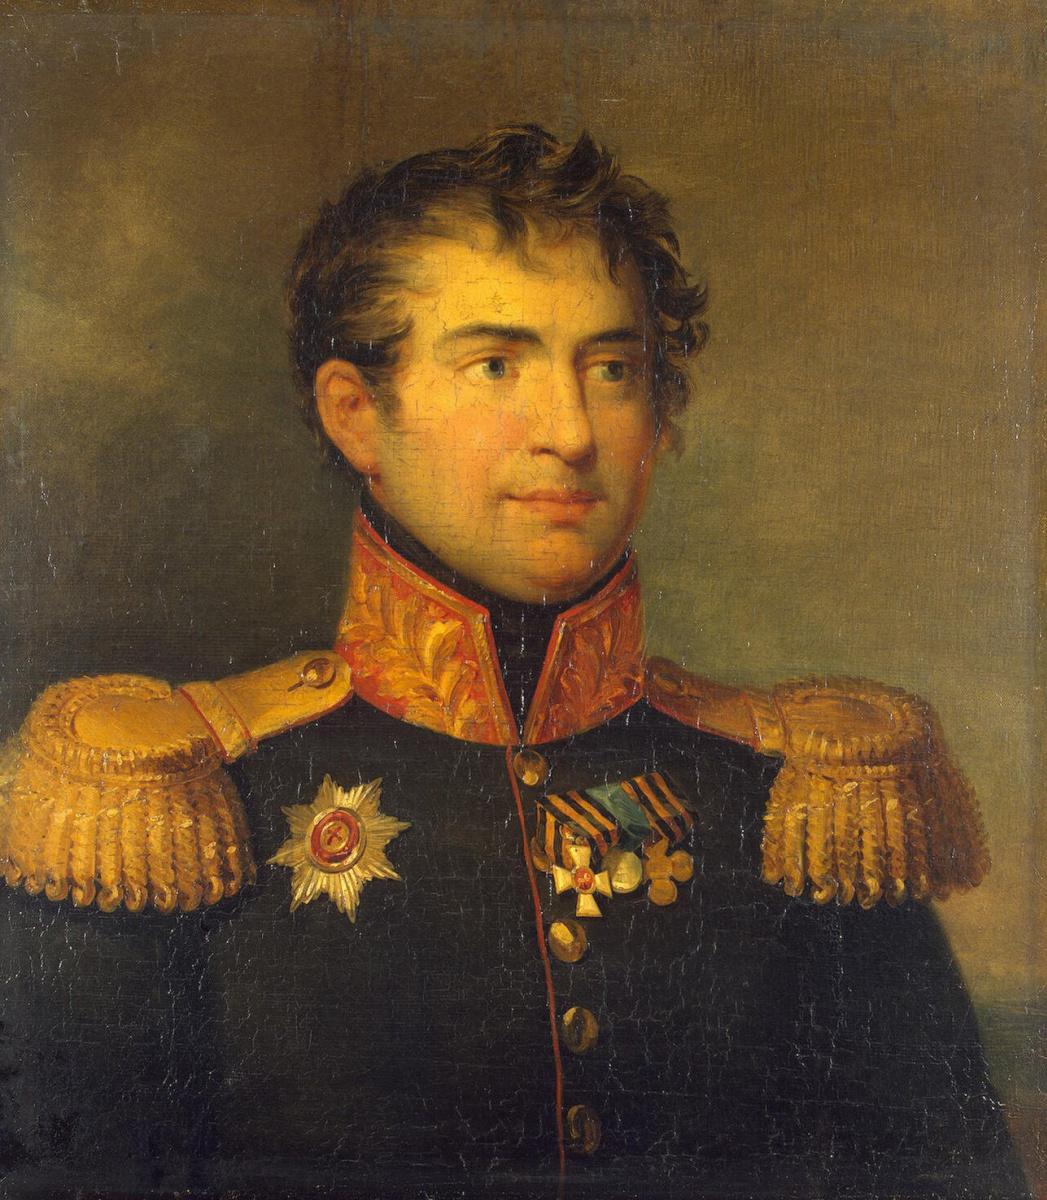 Джордж Доу. Портрет Карла Максимовича Герцдорфа